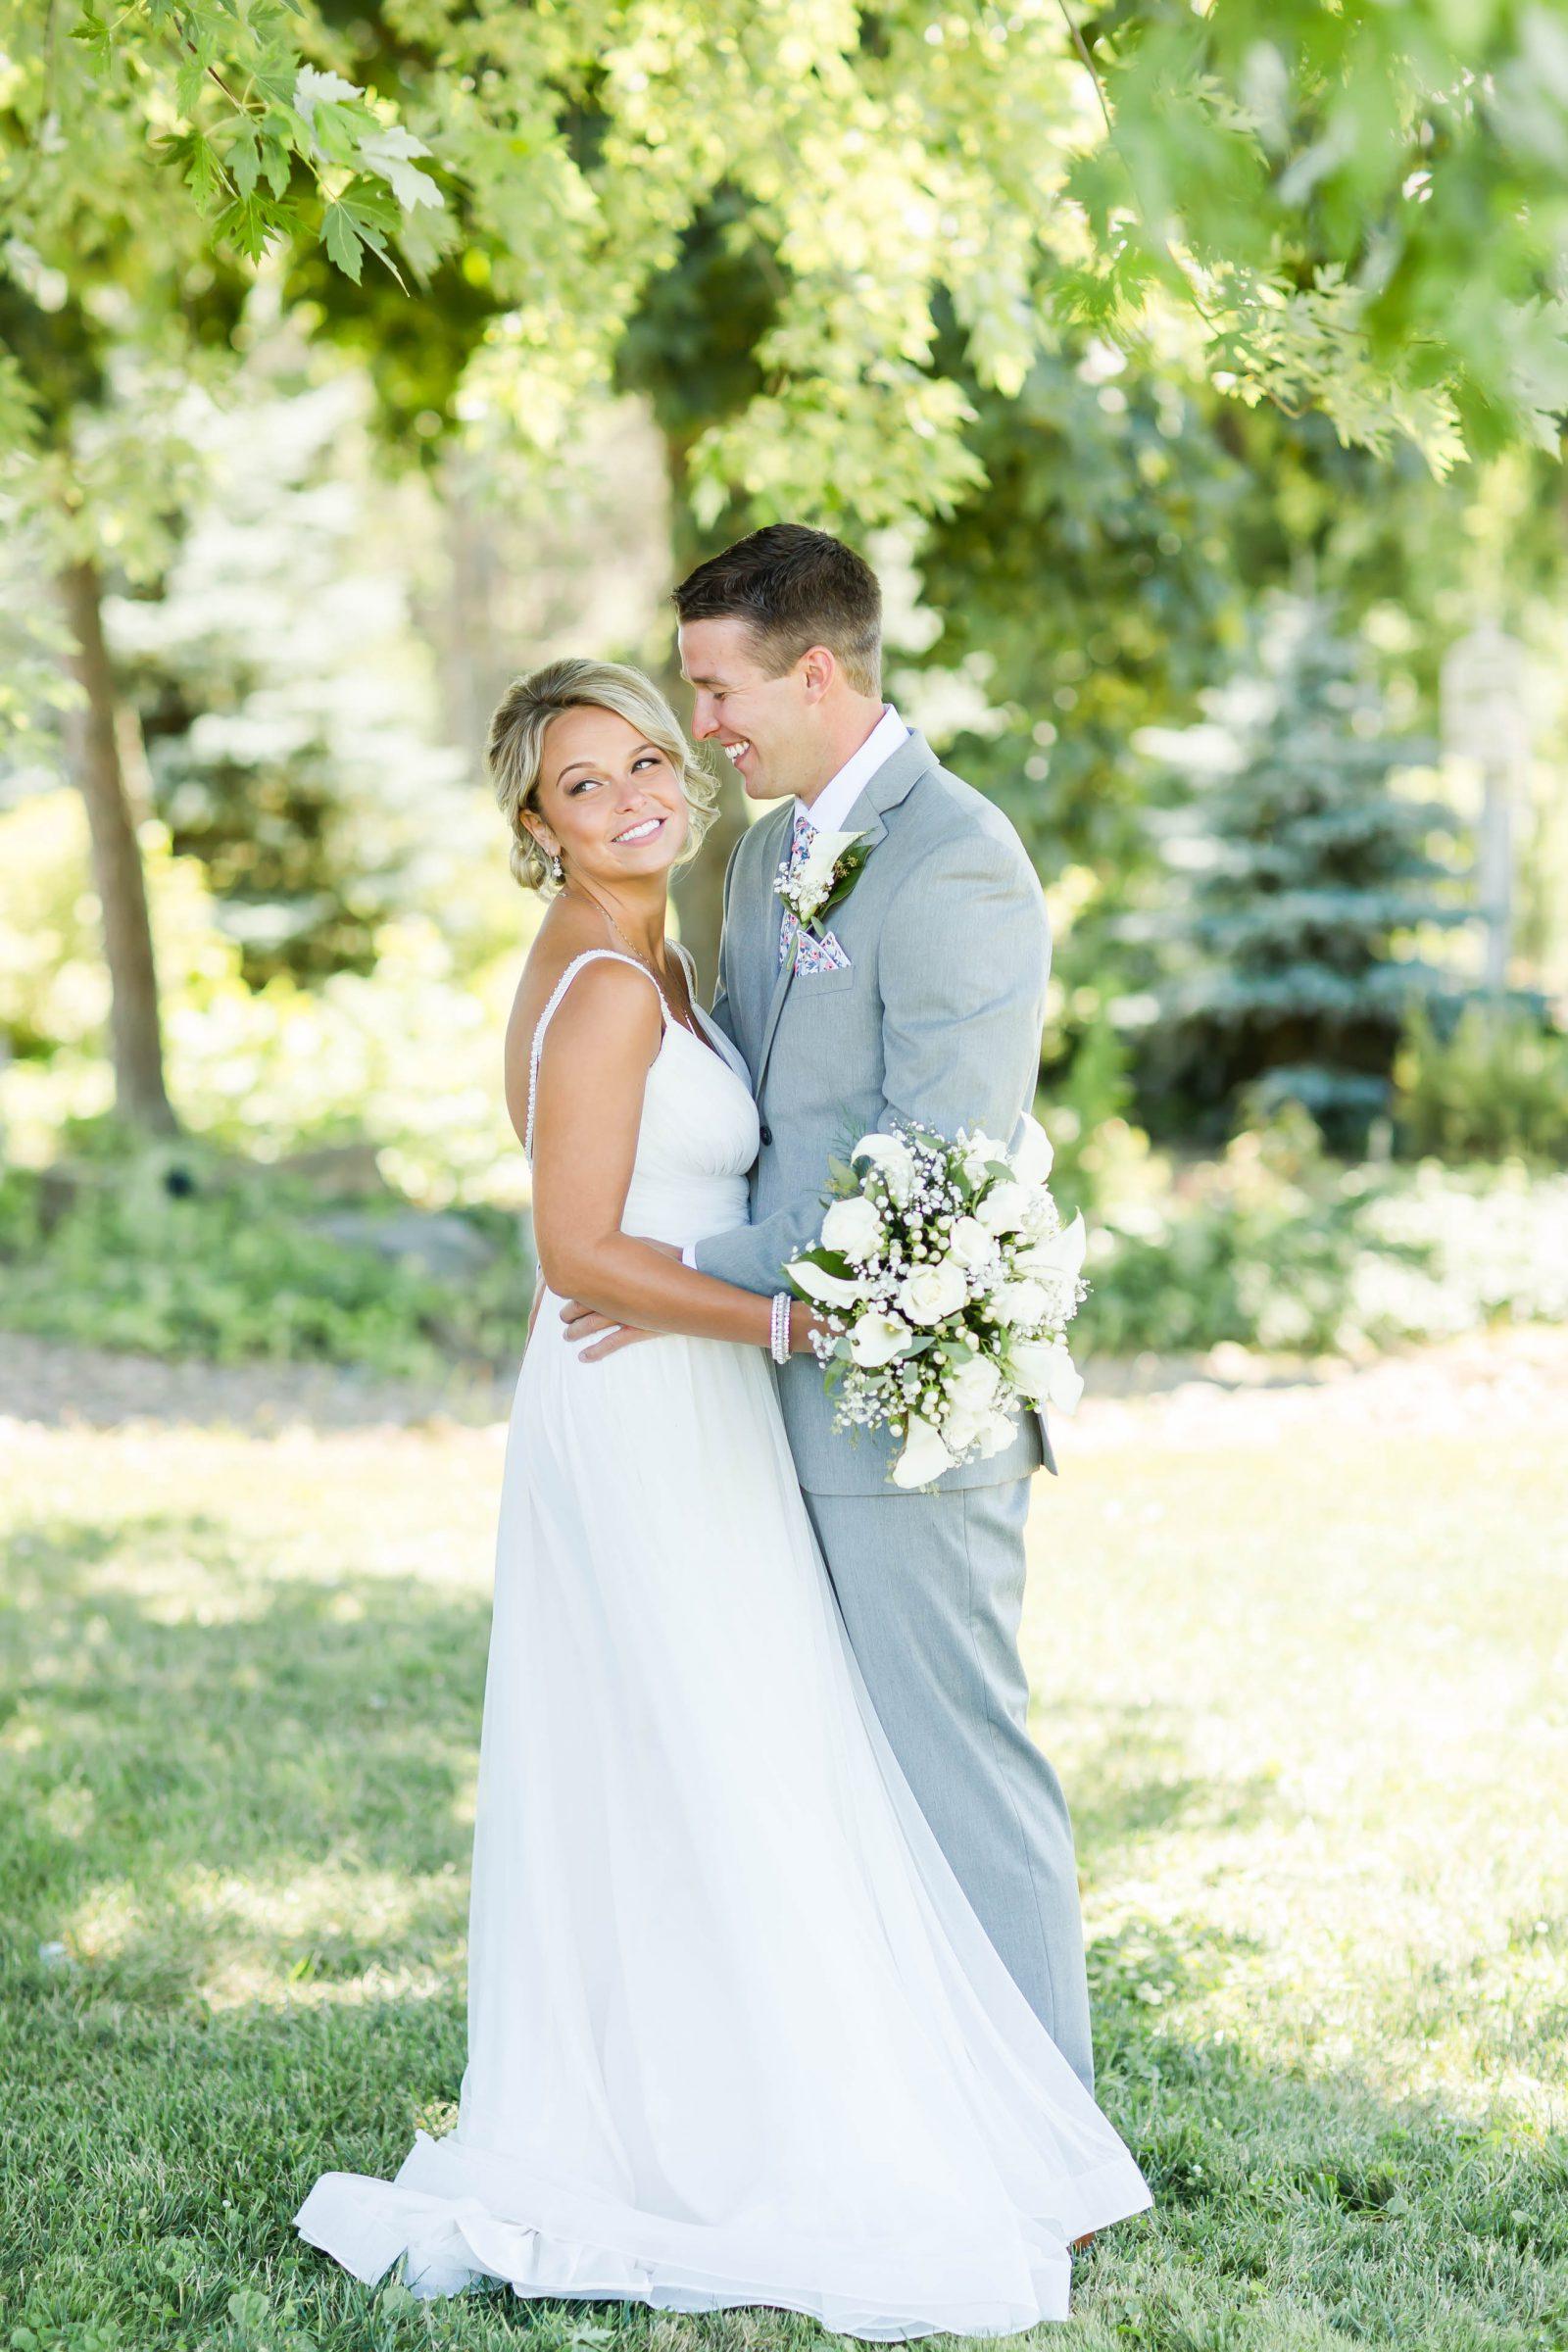 peacock-ridge-summer-wedding-photographer-akron-ohio-loren-jackson-photography-43